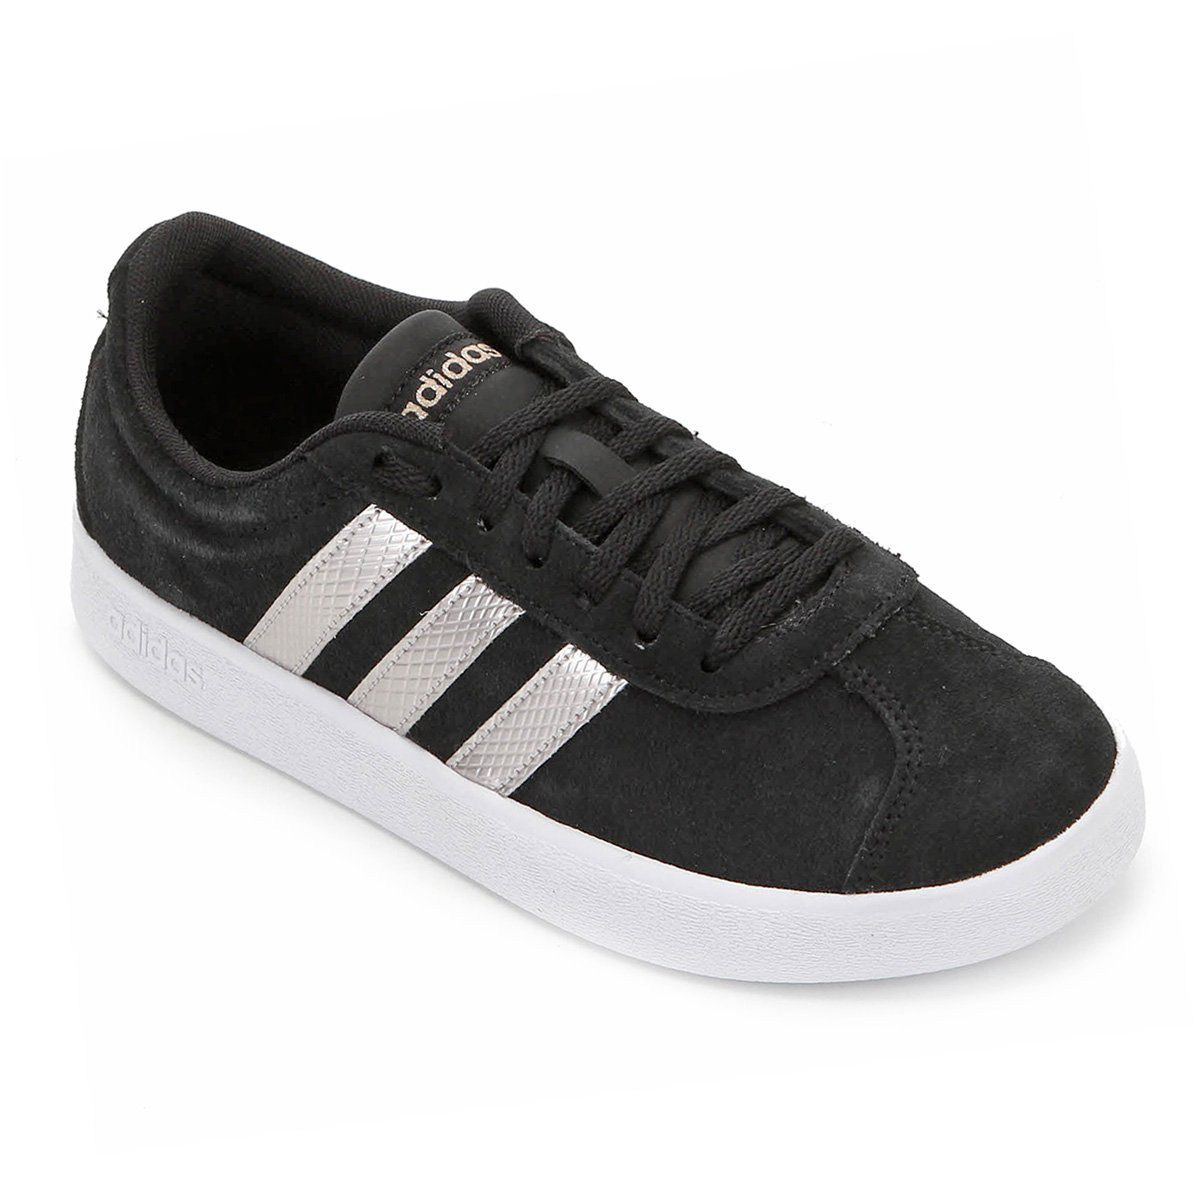 Tênis Adidas Vl Court 20 Feminino Preto Branco